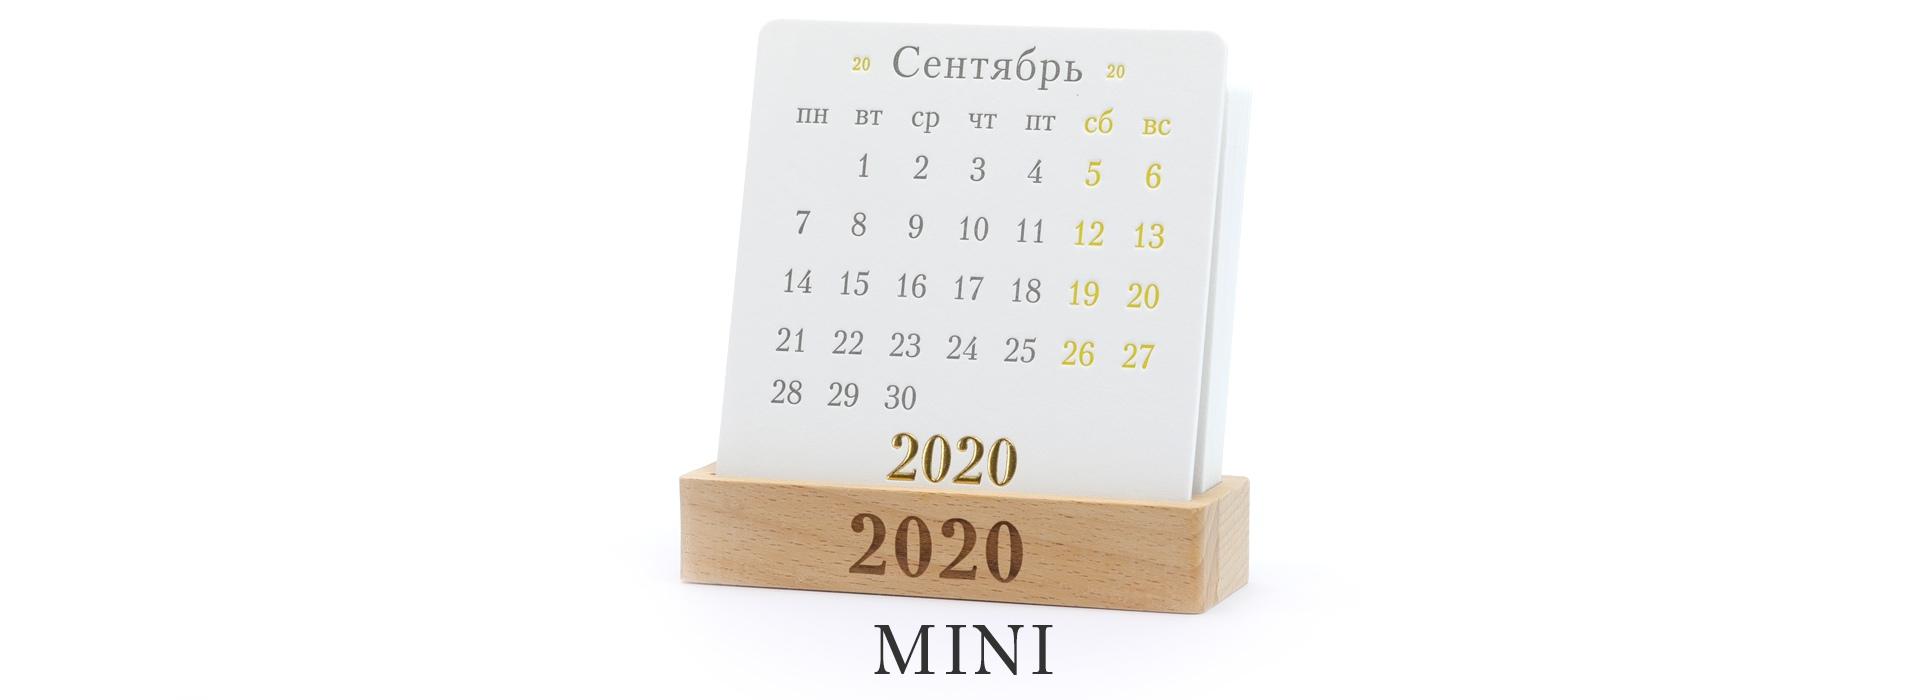 Календарь на подставке МИНИ 2020